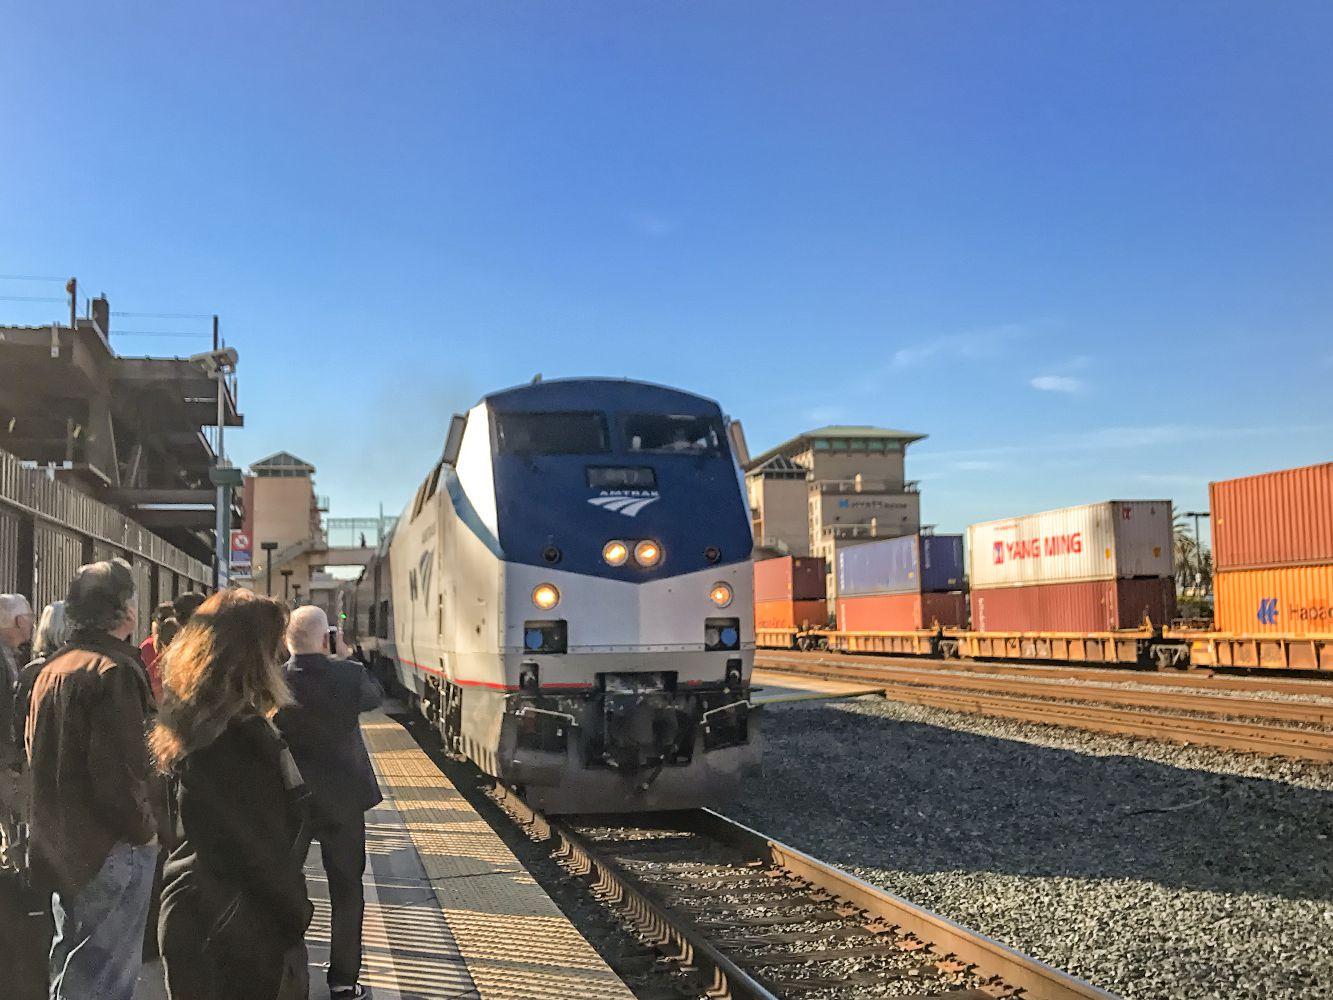 Amtrak to Reno - California Zephyr Over the Sierras